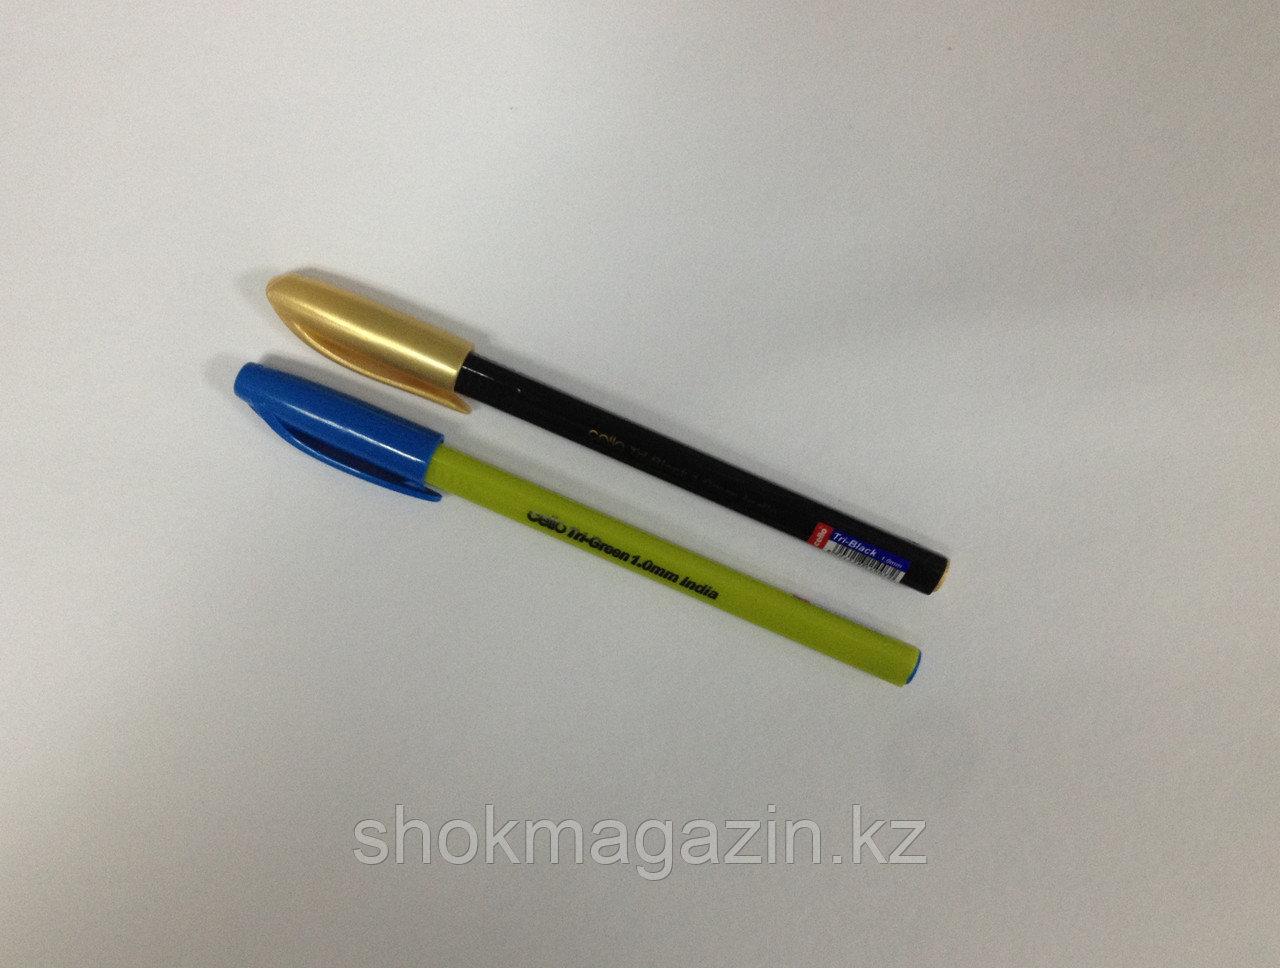 Ручка шариковая синяя Cello Tri Black